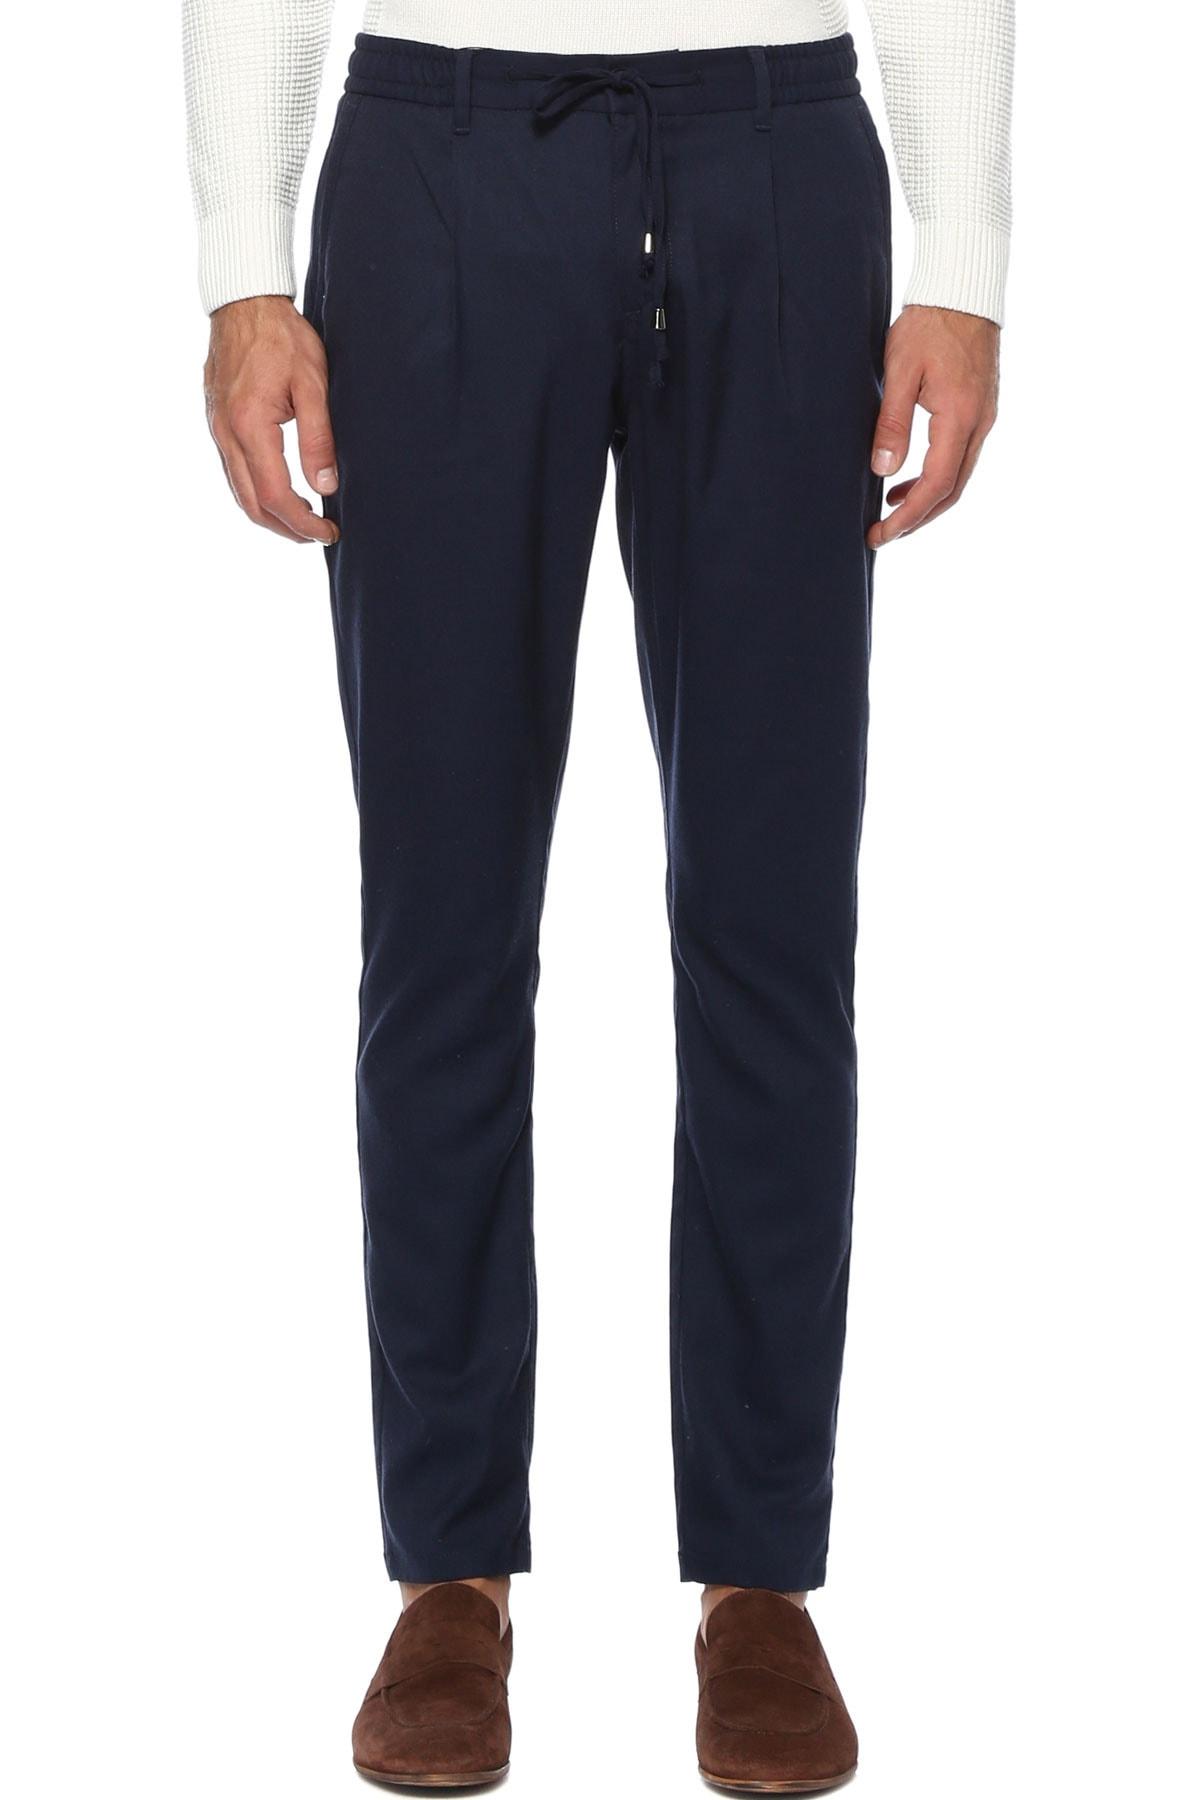 Erkek Lacivert Pantolon 1076599